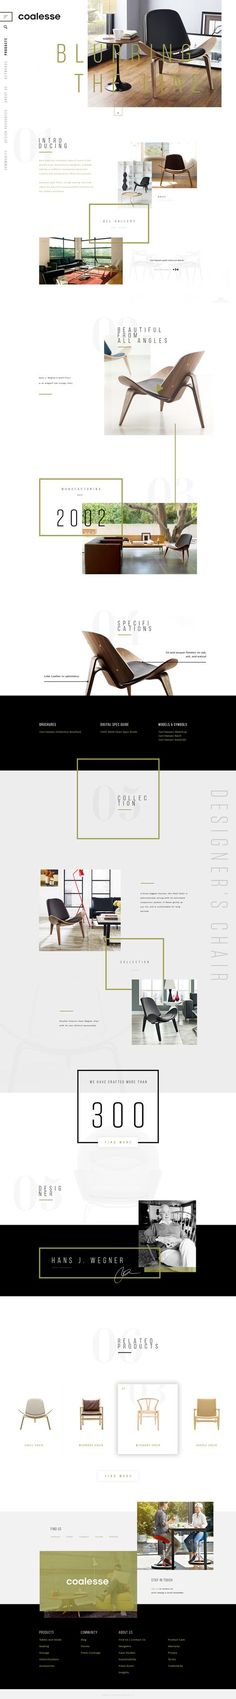 Coalesse Concept Website